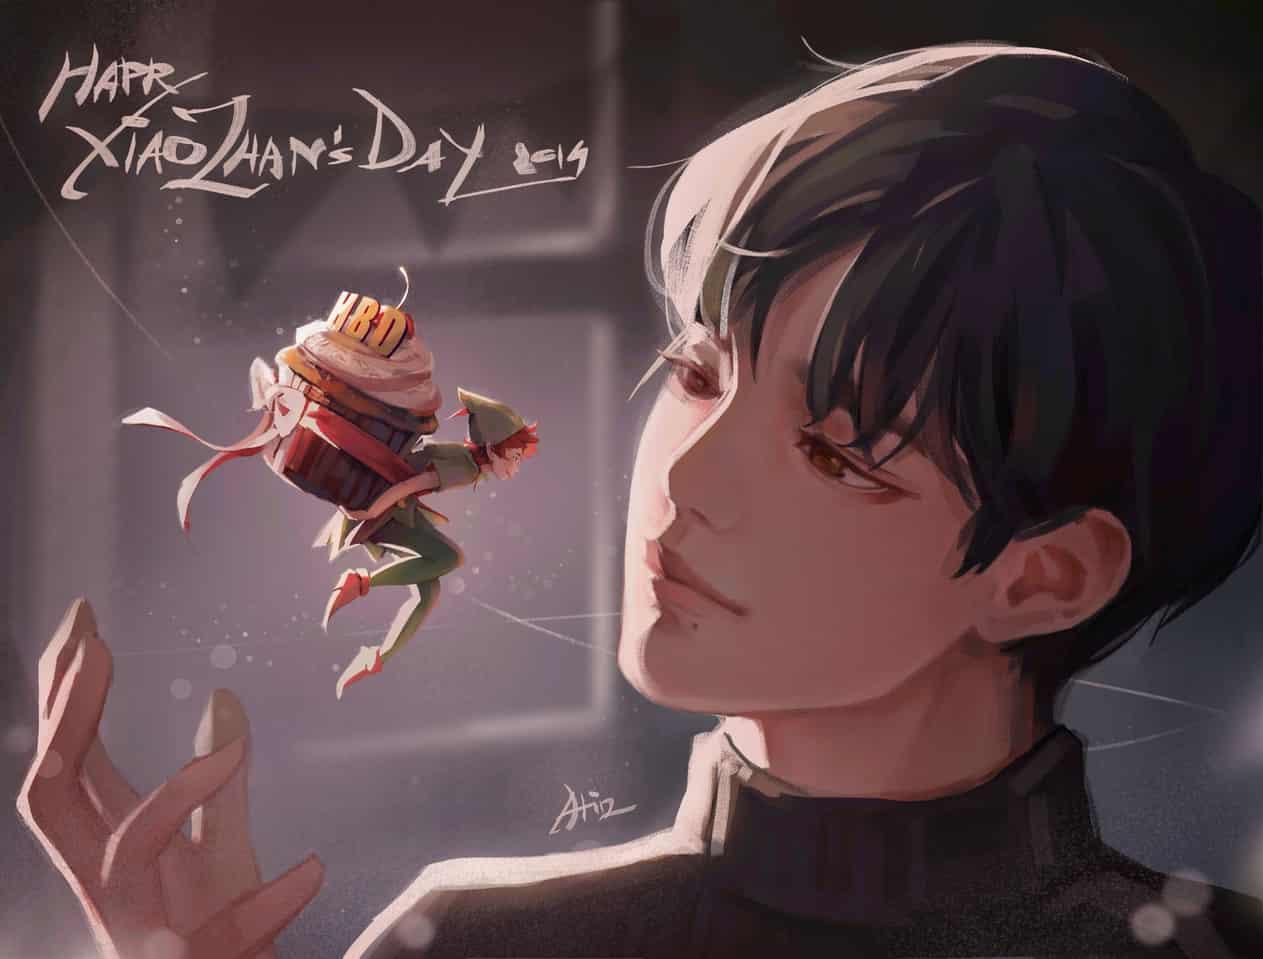 Happy Xiao Zhan's Day Illust of Atin #xiaozhan